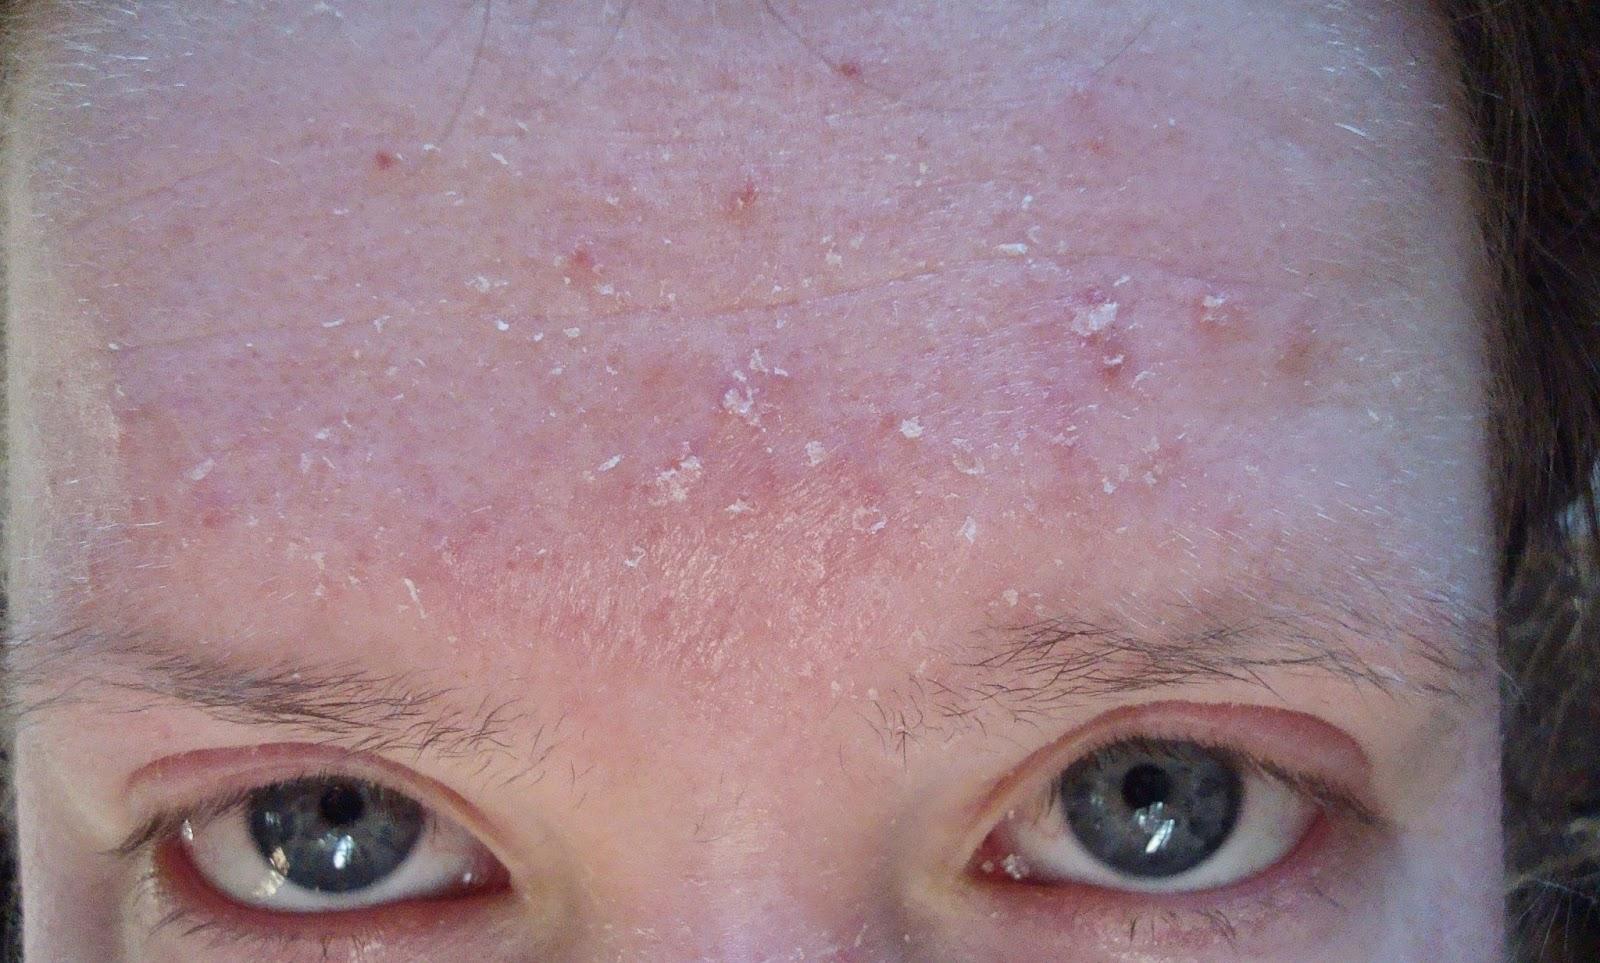 Rash Face Scalp And Burning